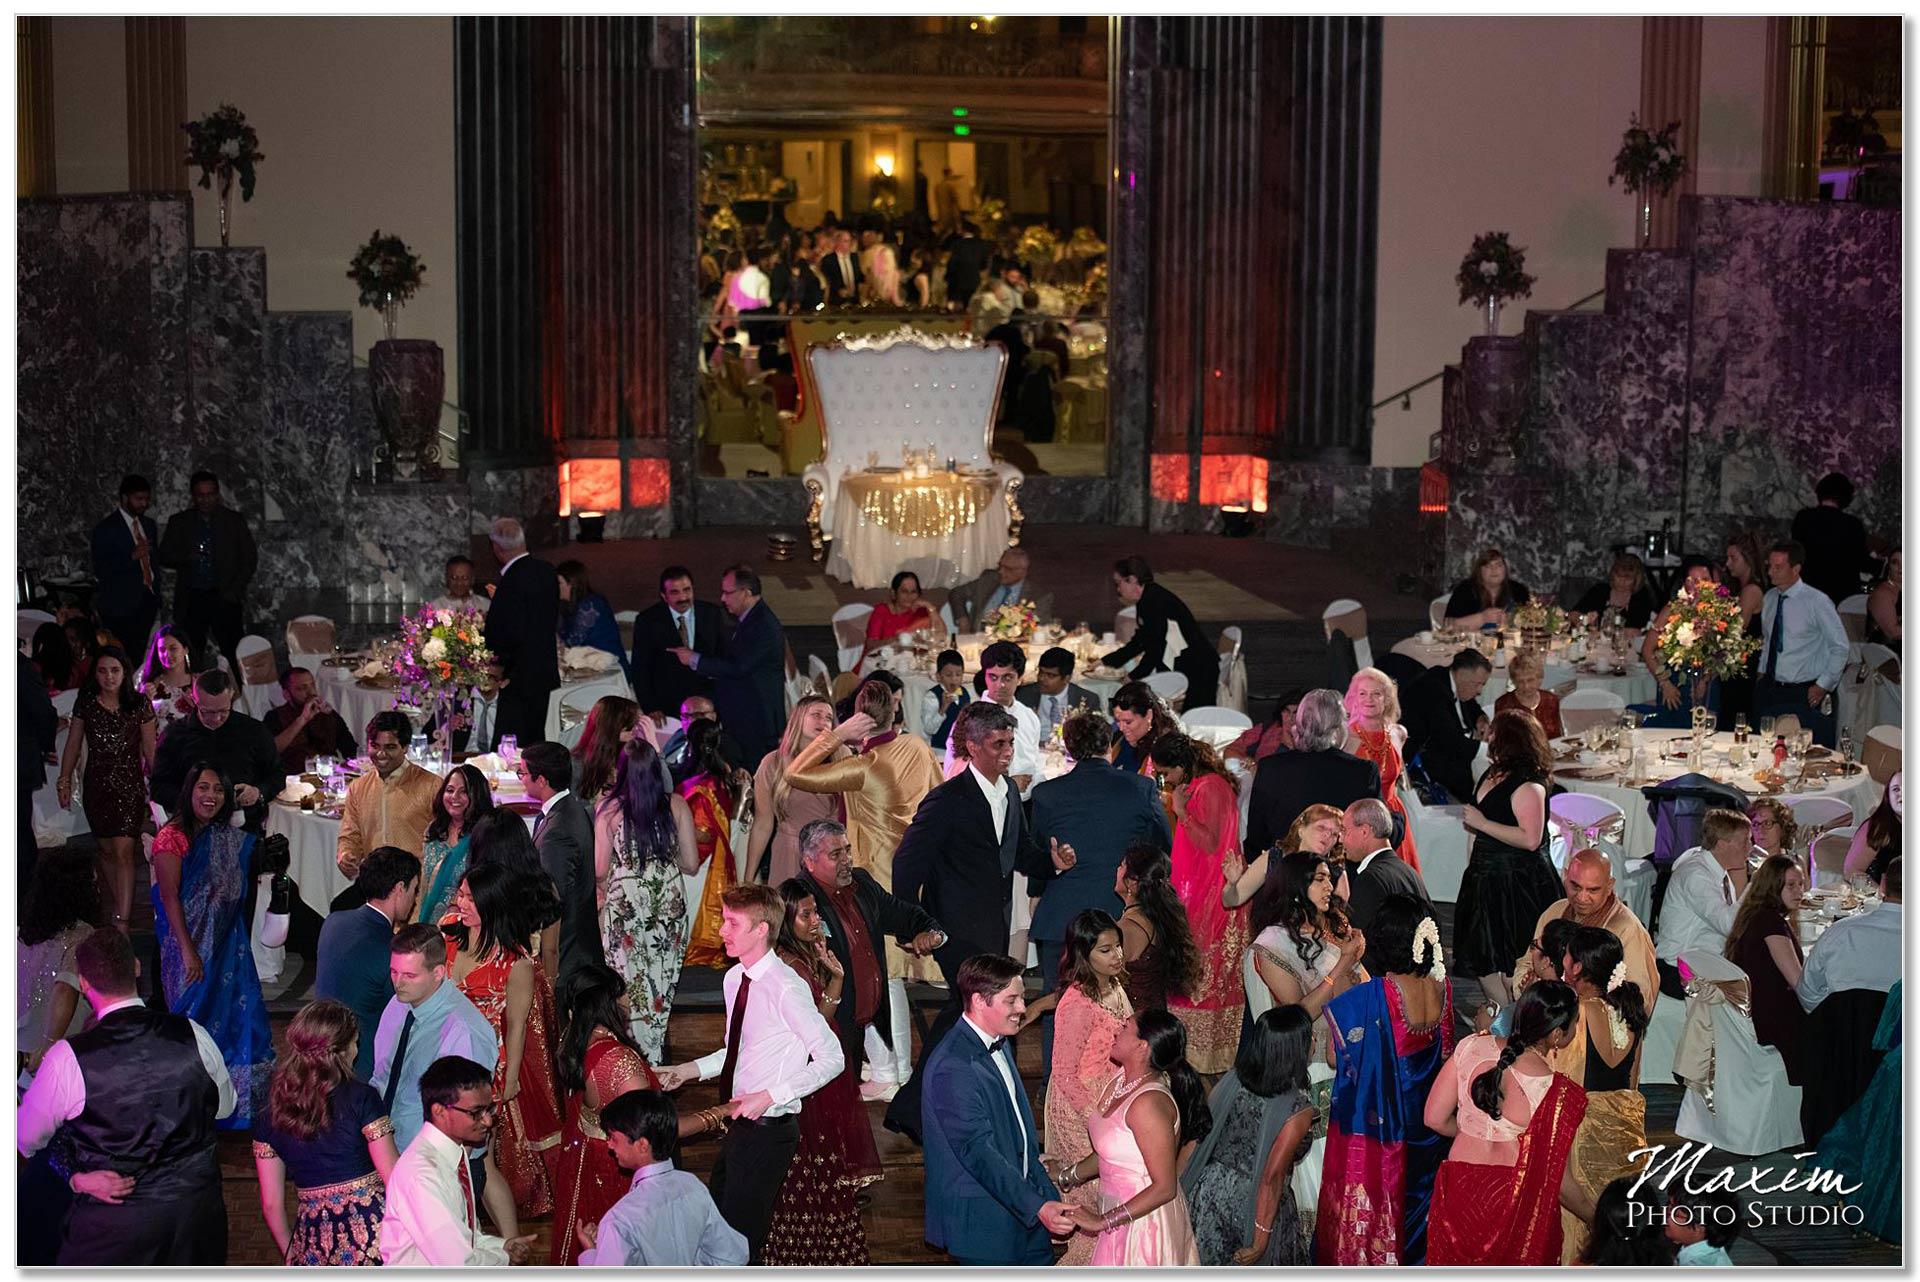 Hilton Netherland Plaza Hindu Wedding Reception dancing fun